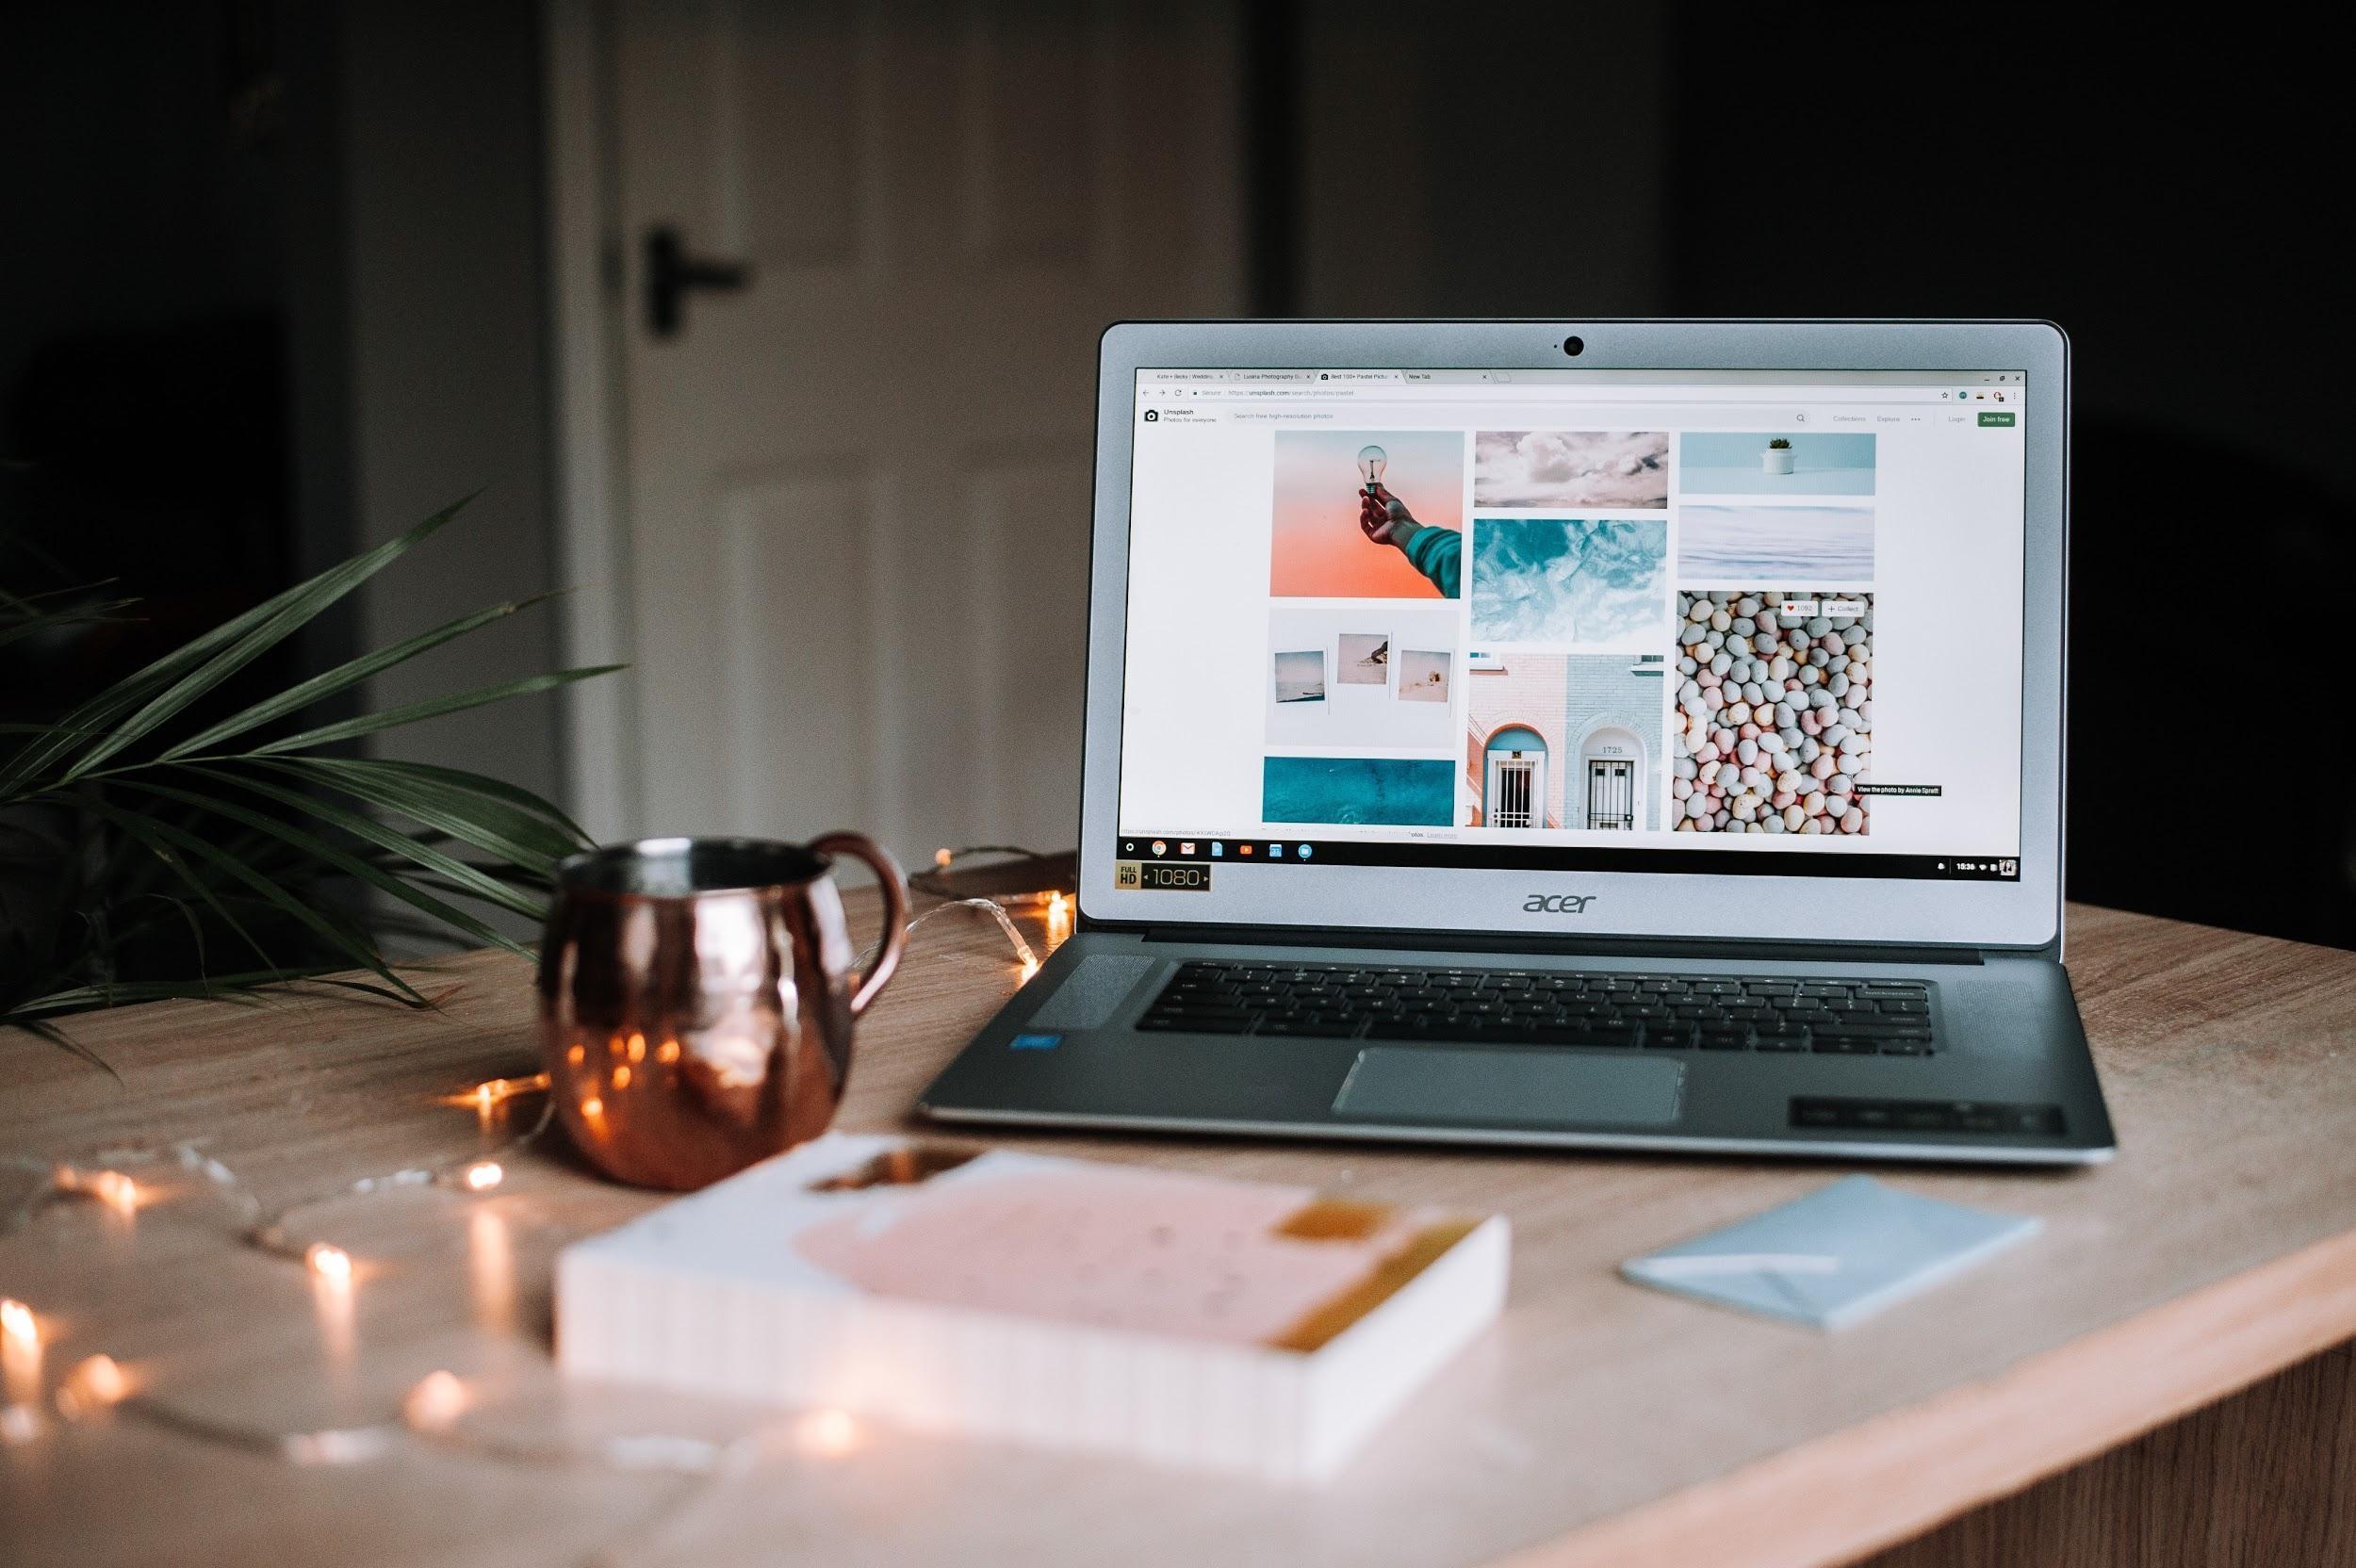 Basic Content a Website Should Have